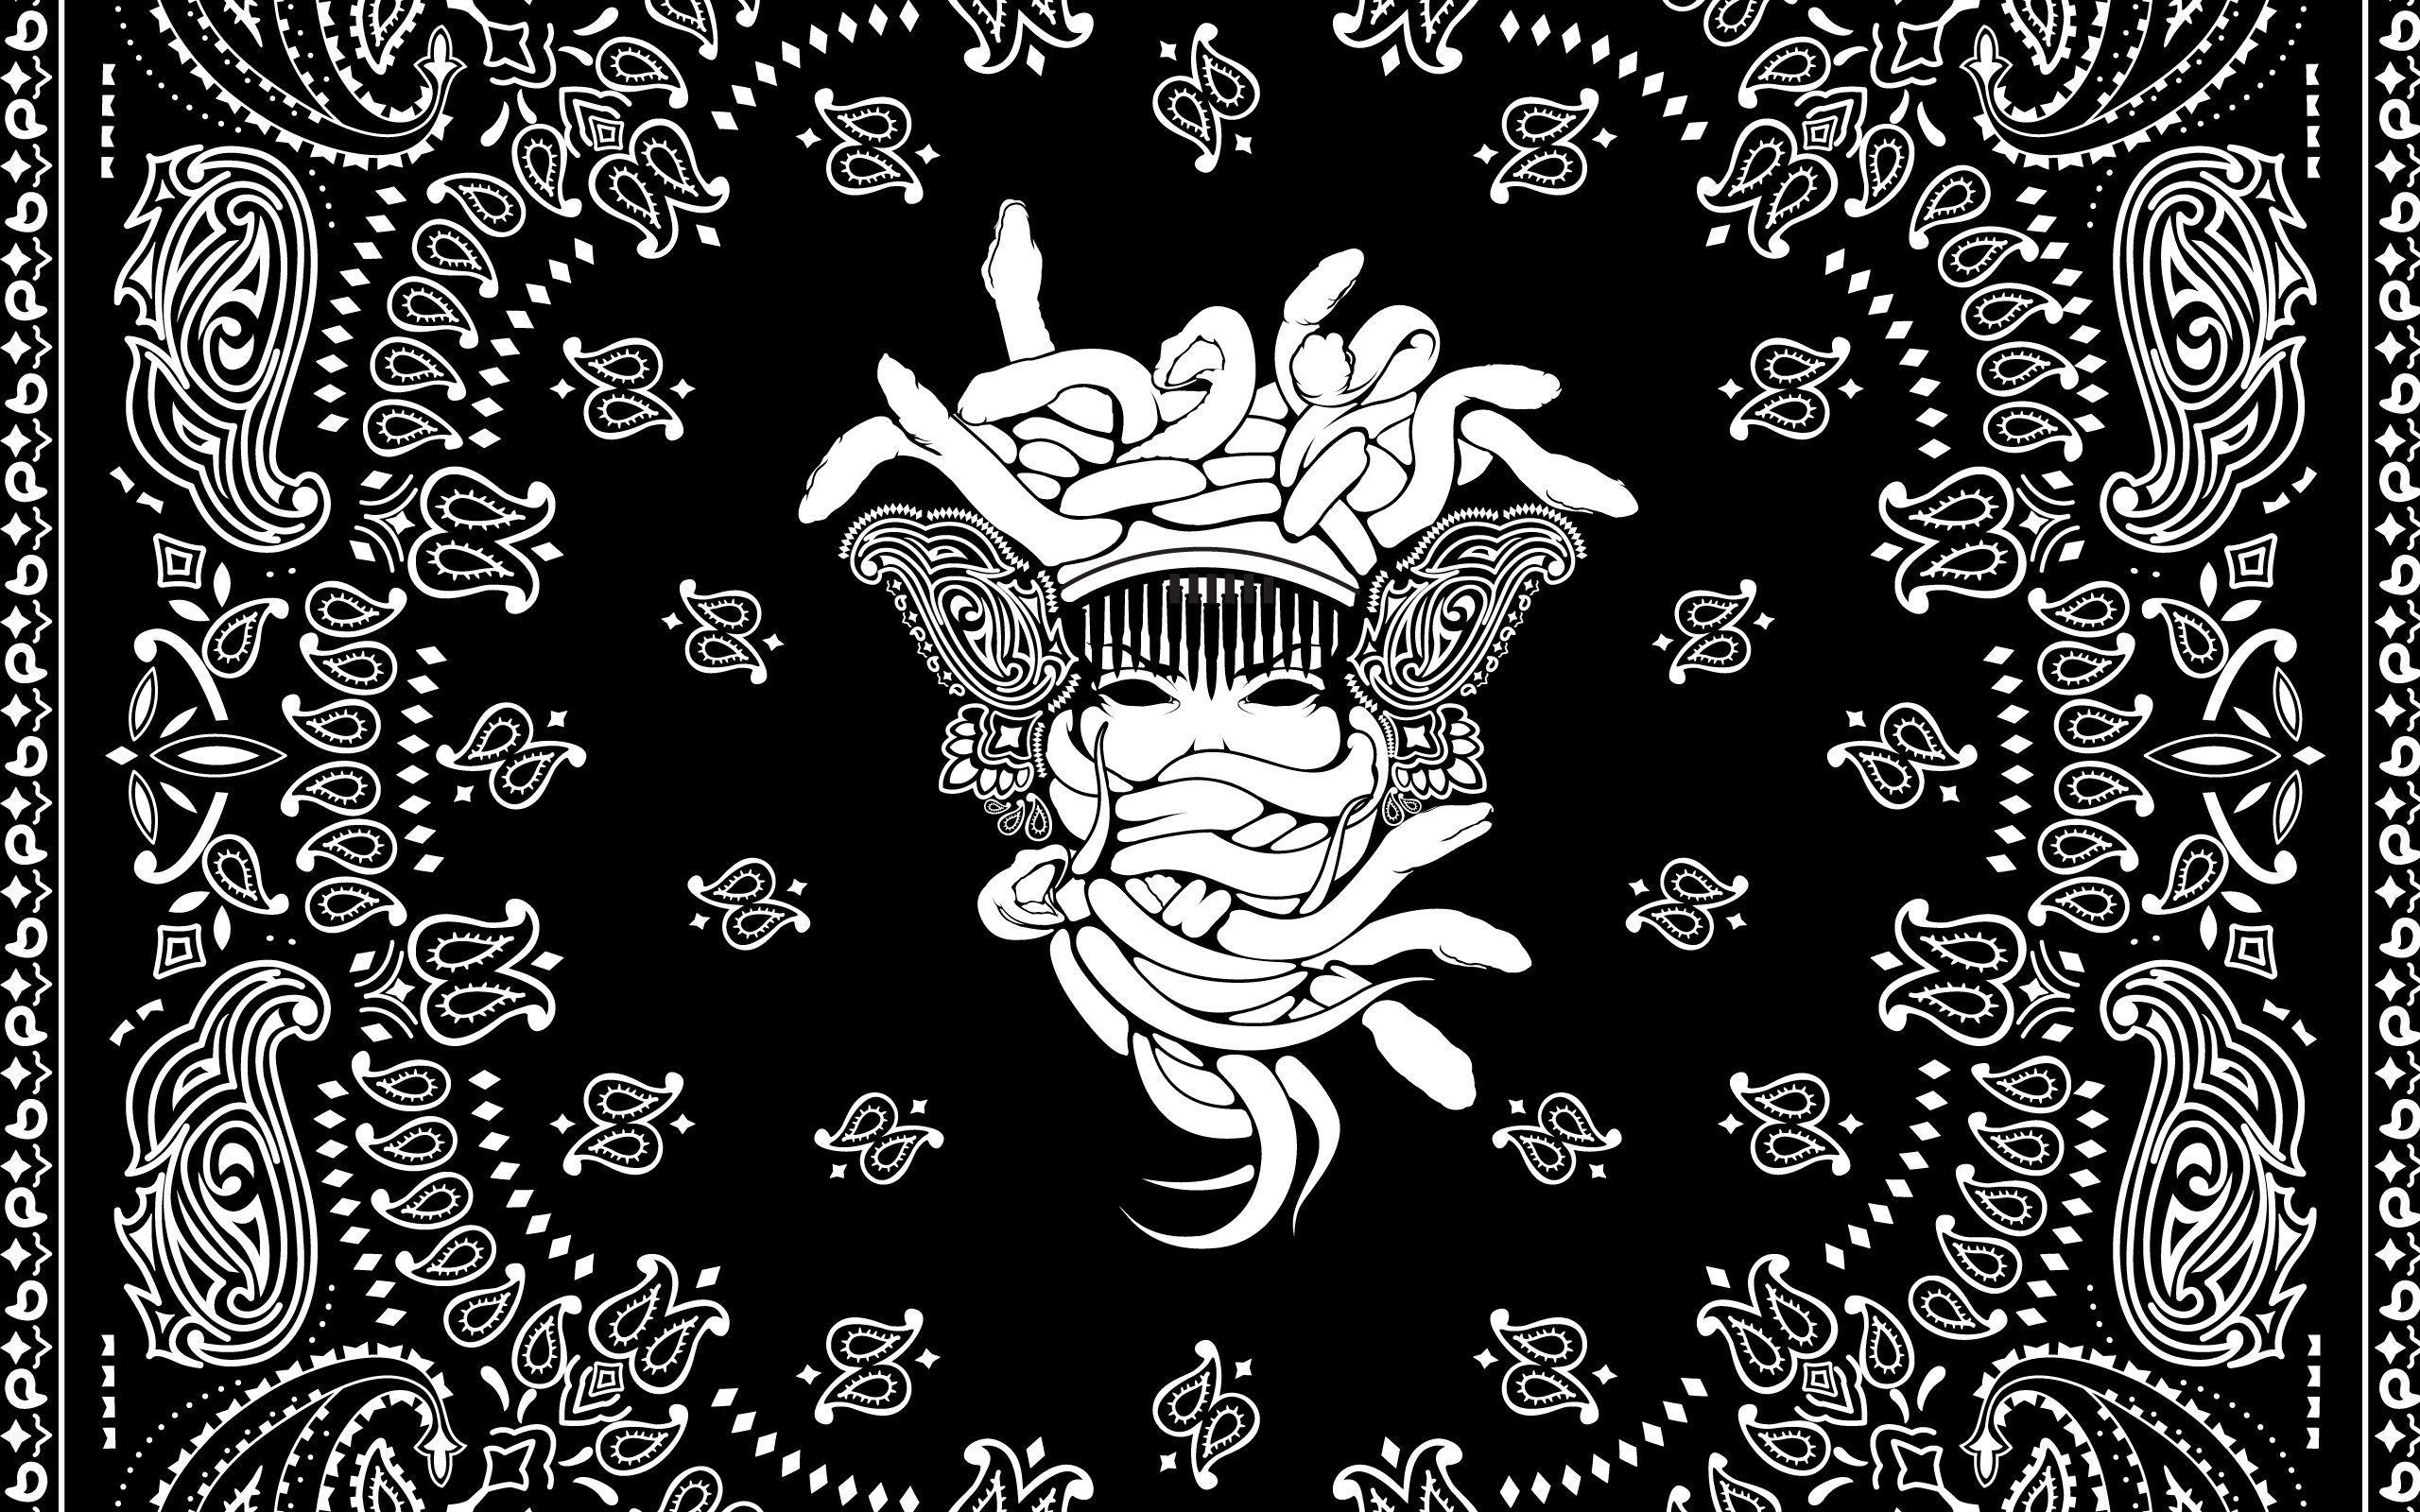 Crip Bandana Wallpapers - Wallpaper Cave